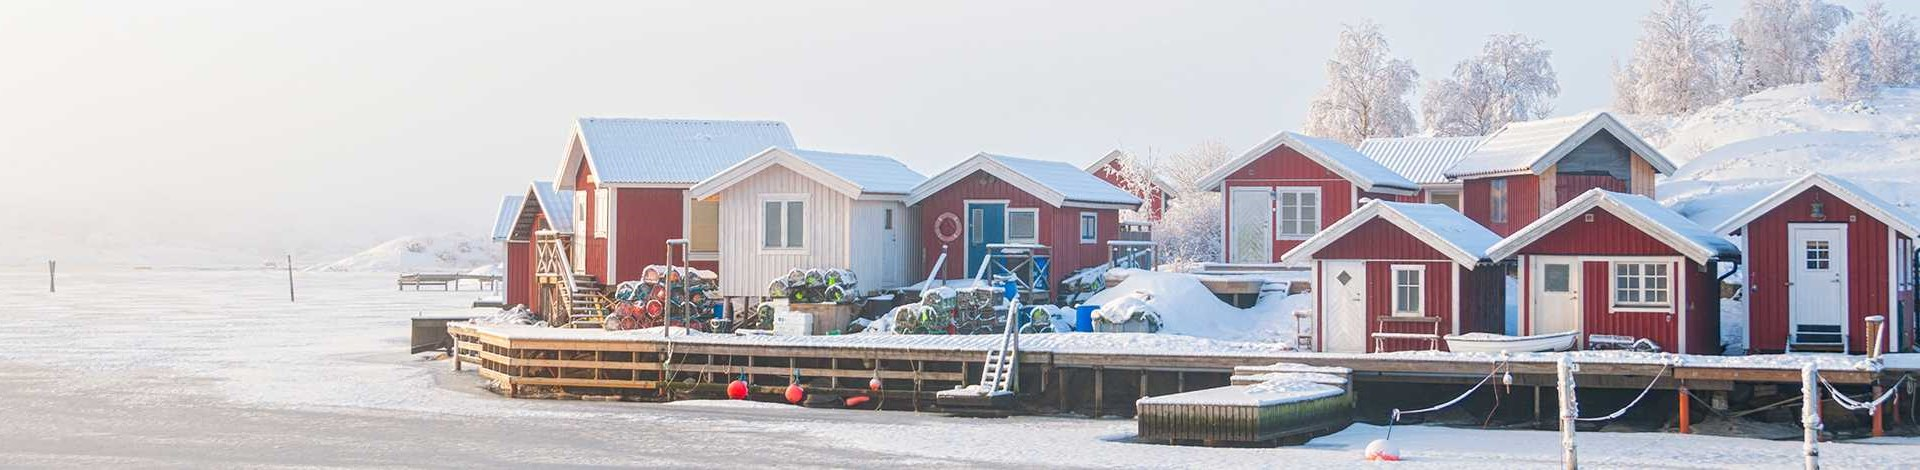 Soderhamn